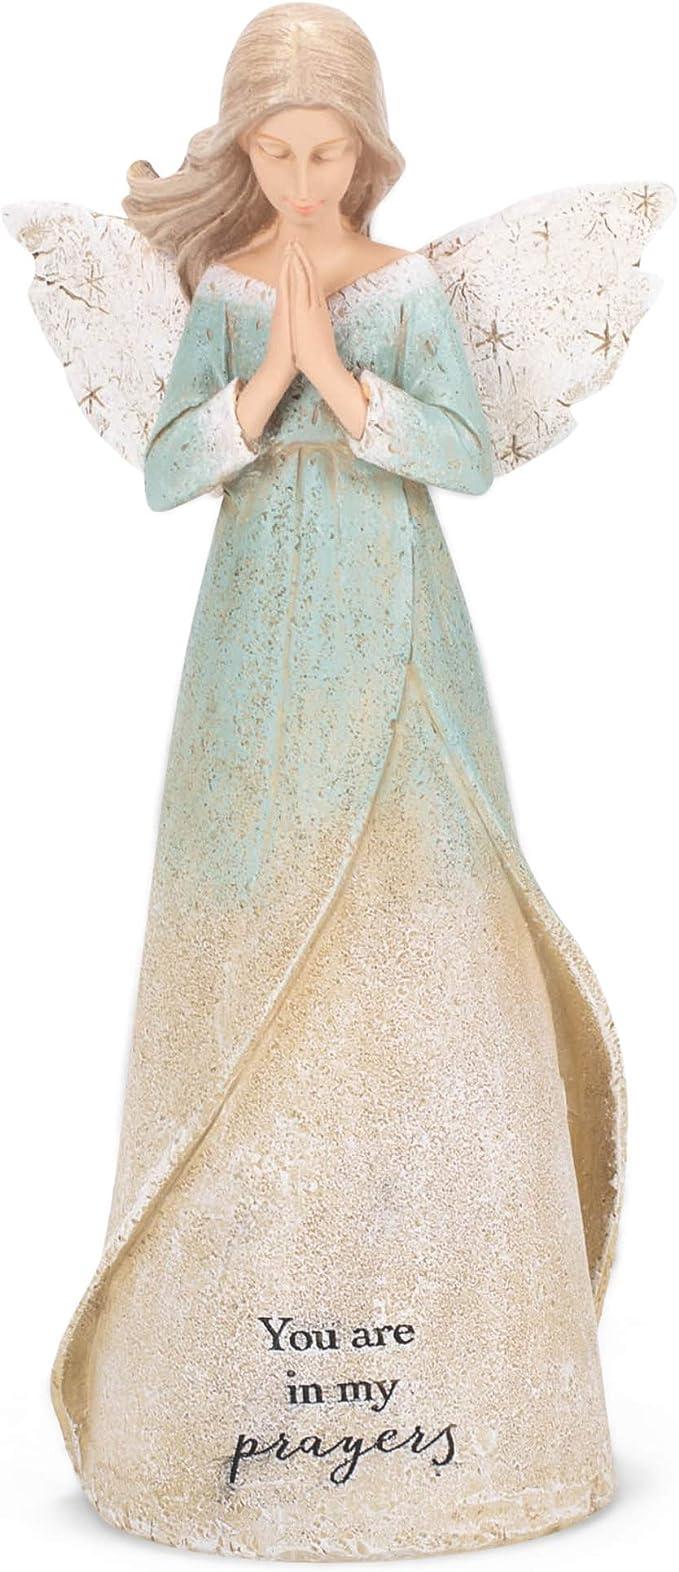 Roman Inc 8 5 H Bereavement Angel With Dove Karen Hahn Angel 12571 Amazon Ca Home Kitchen